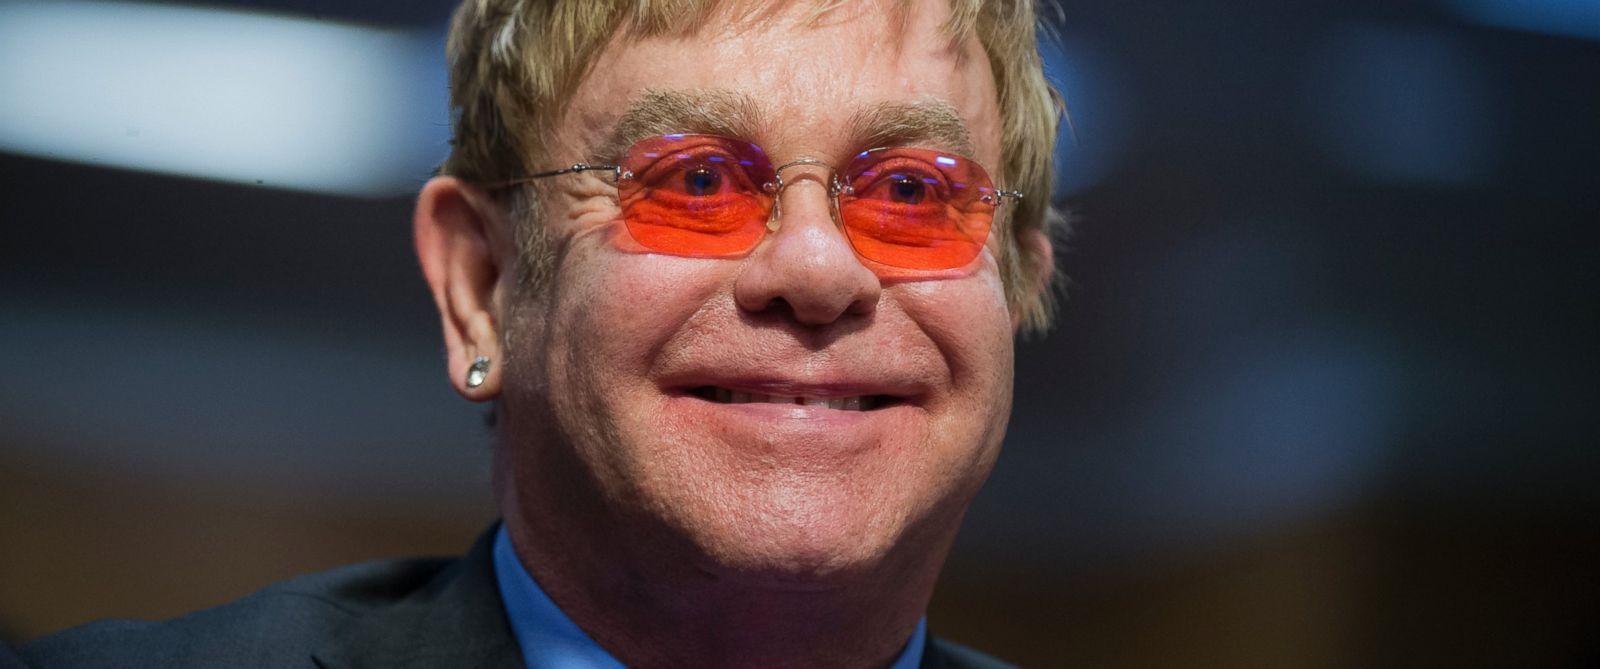 PHOTO: Elton John testifies before a Senate Subcommittee hearing in Washington, D.C., May 6, 2015.